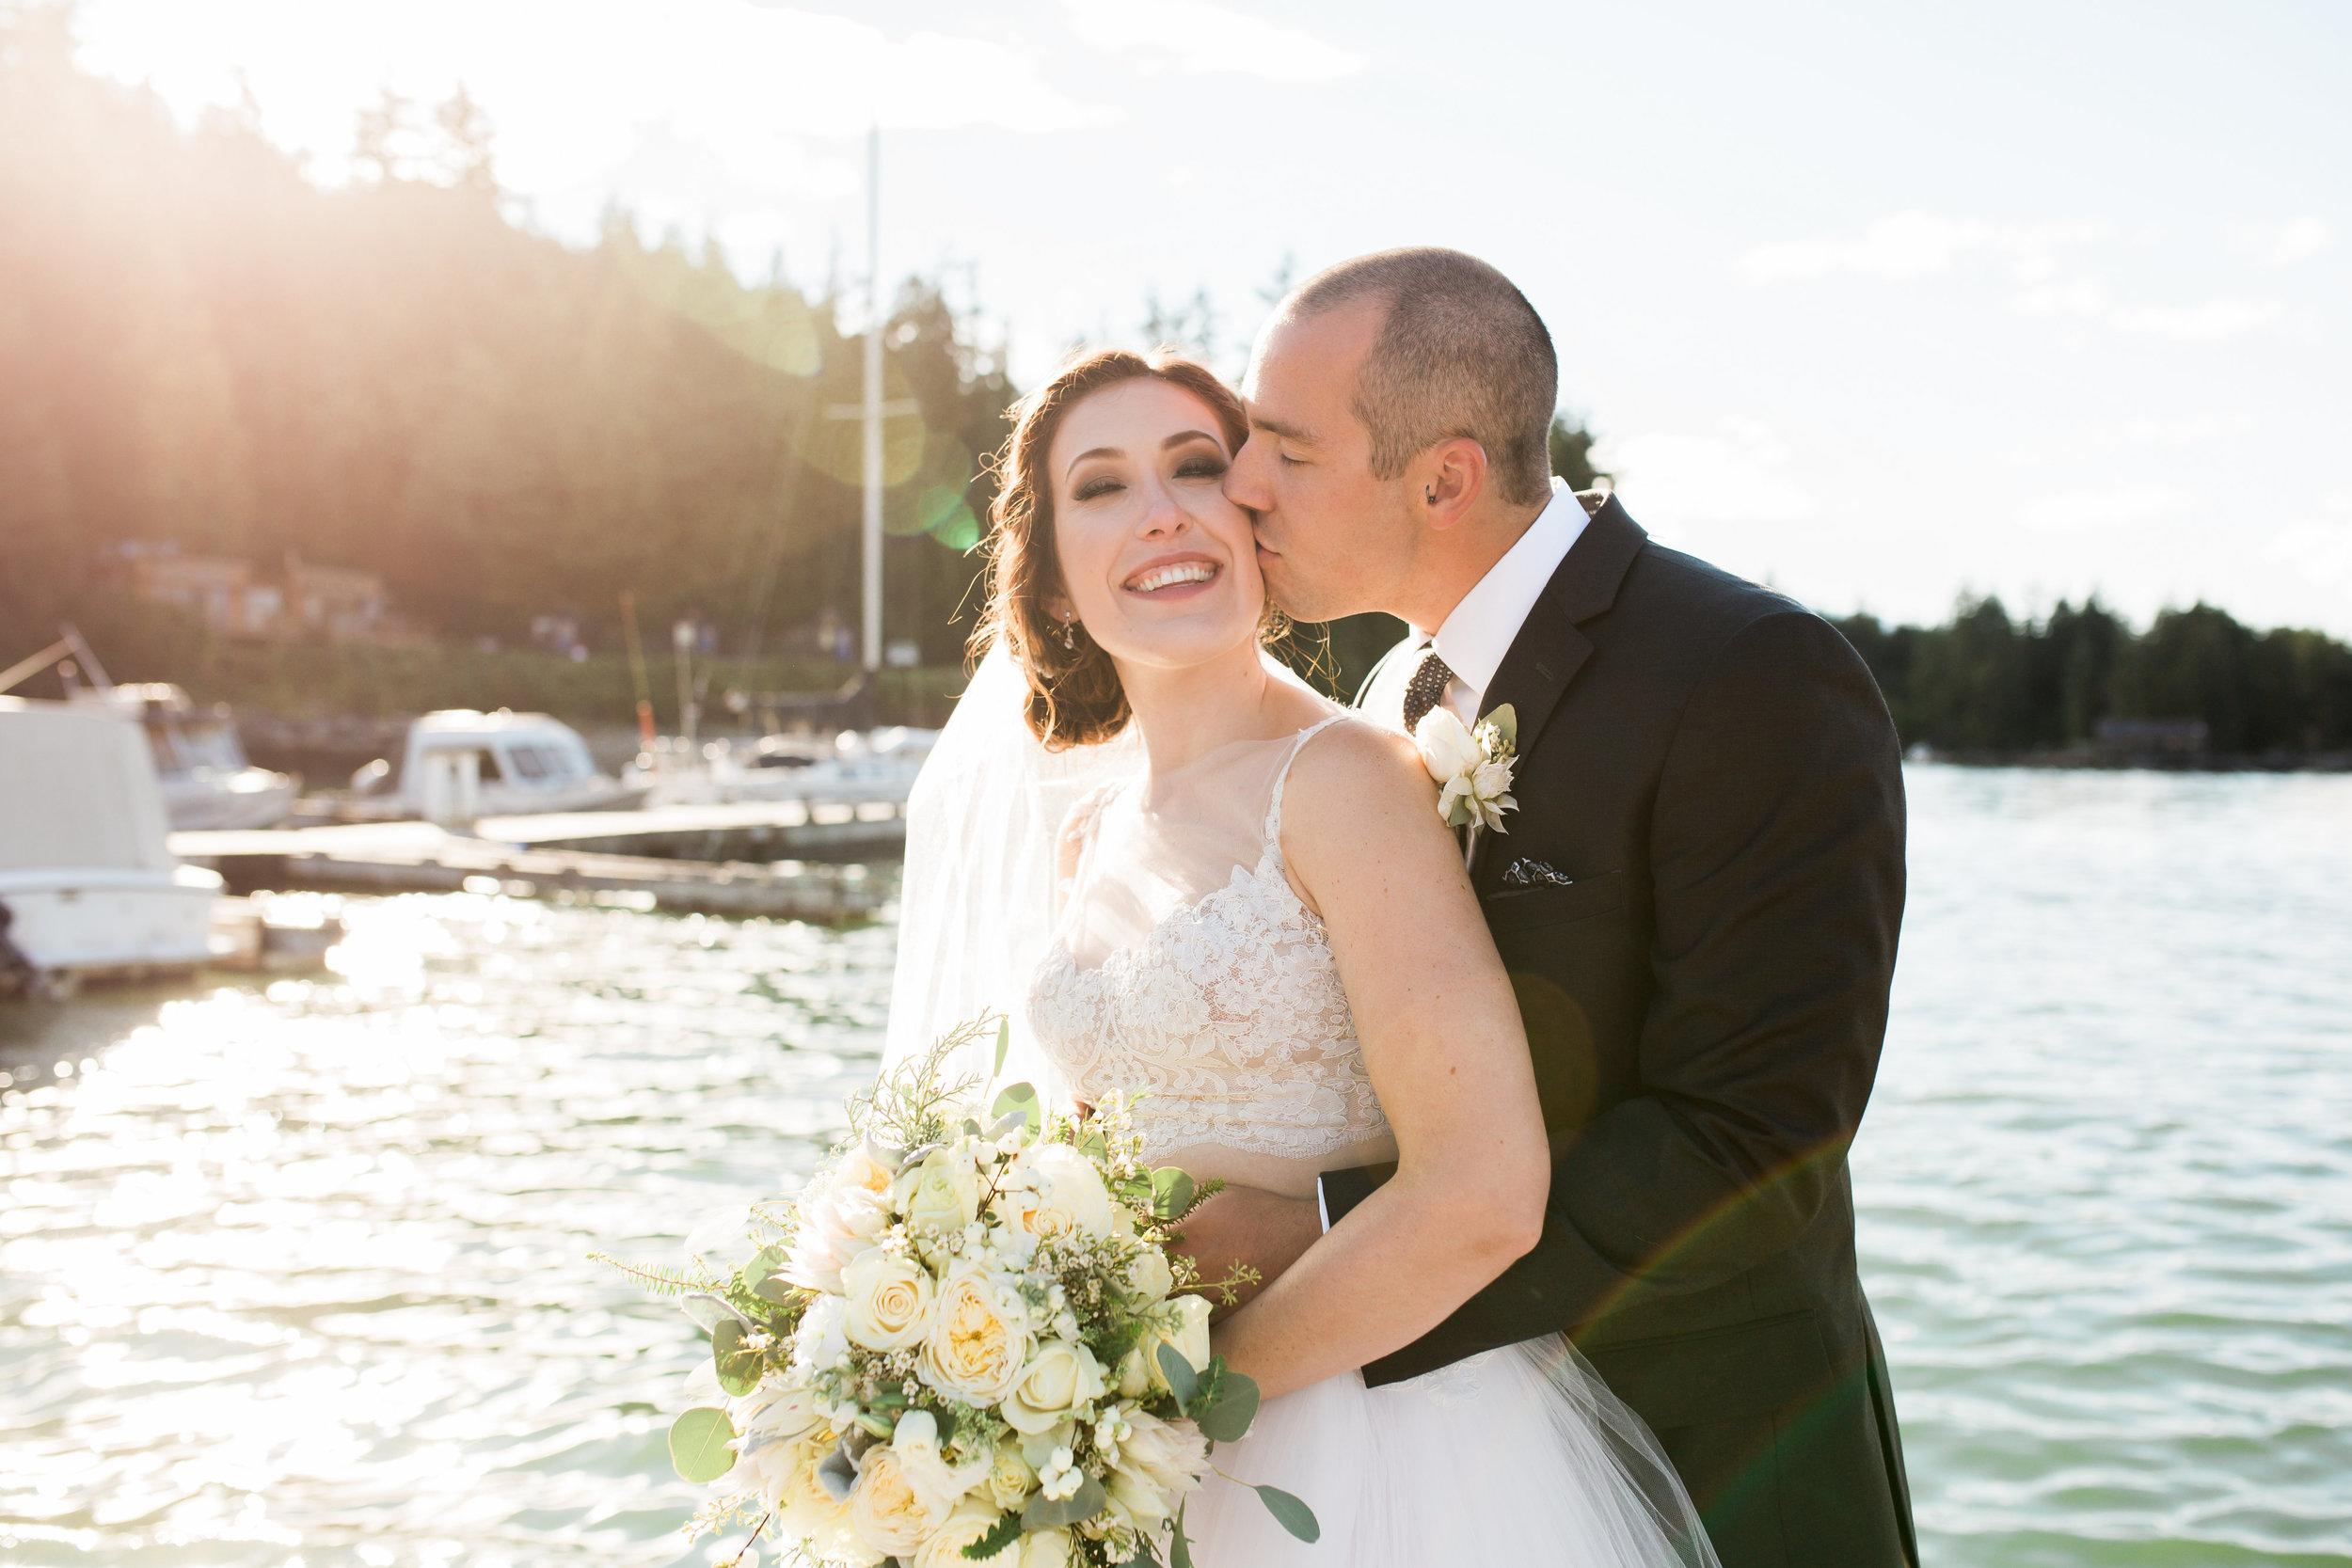 Alicia + Dawson  West Coast Wilderness Resort | Jennifer Picard Photography